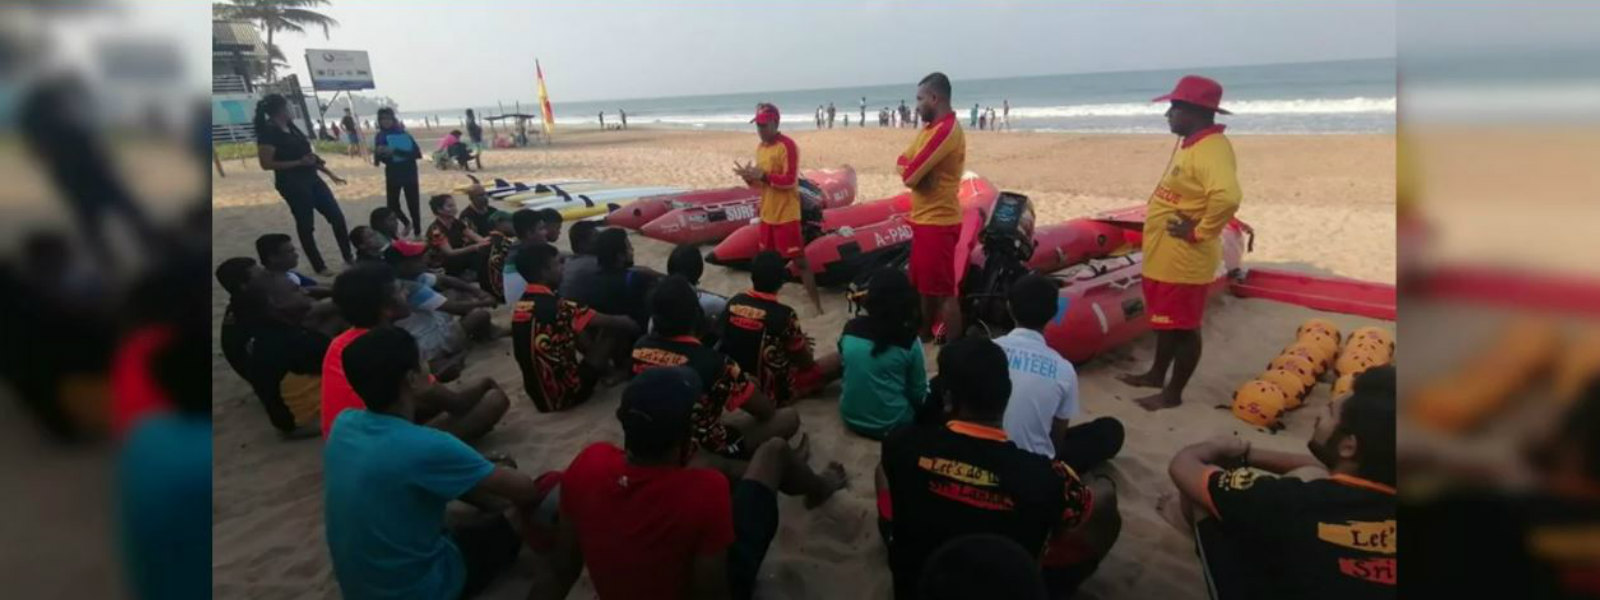 Drowning Prevention : V Force creating volunteer life savers